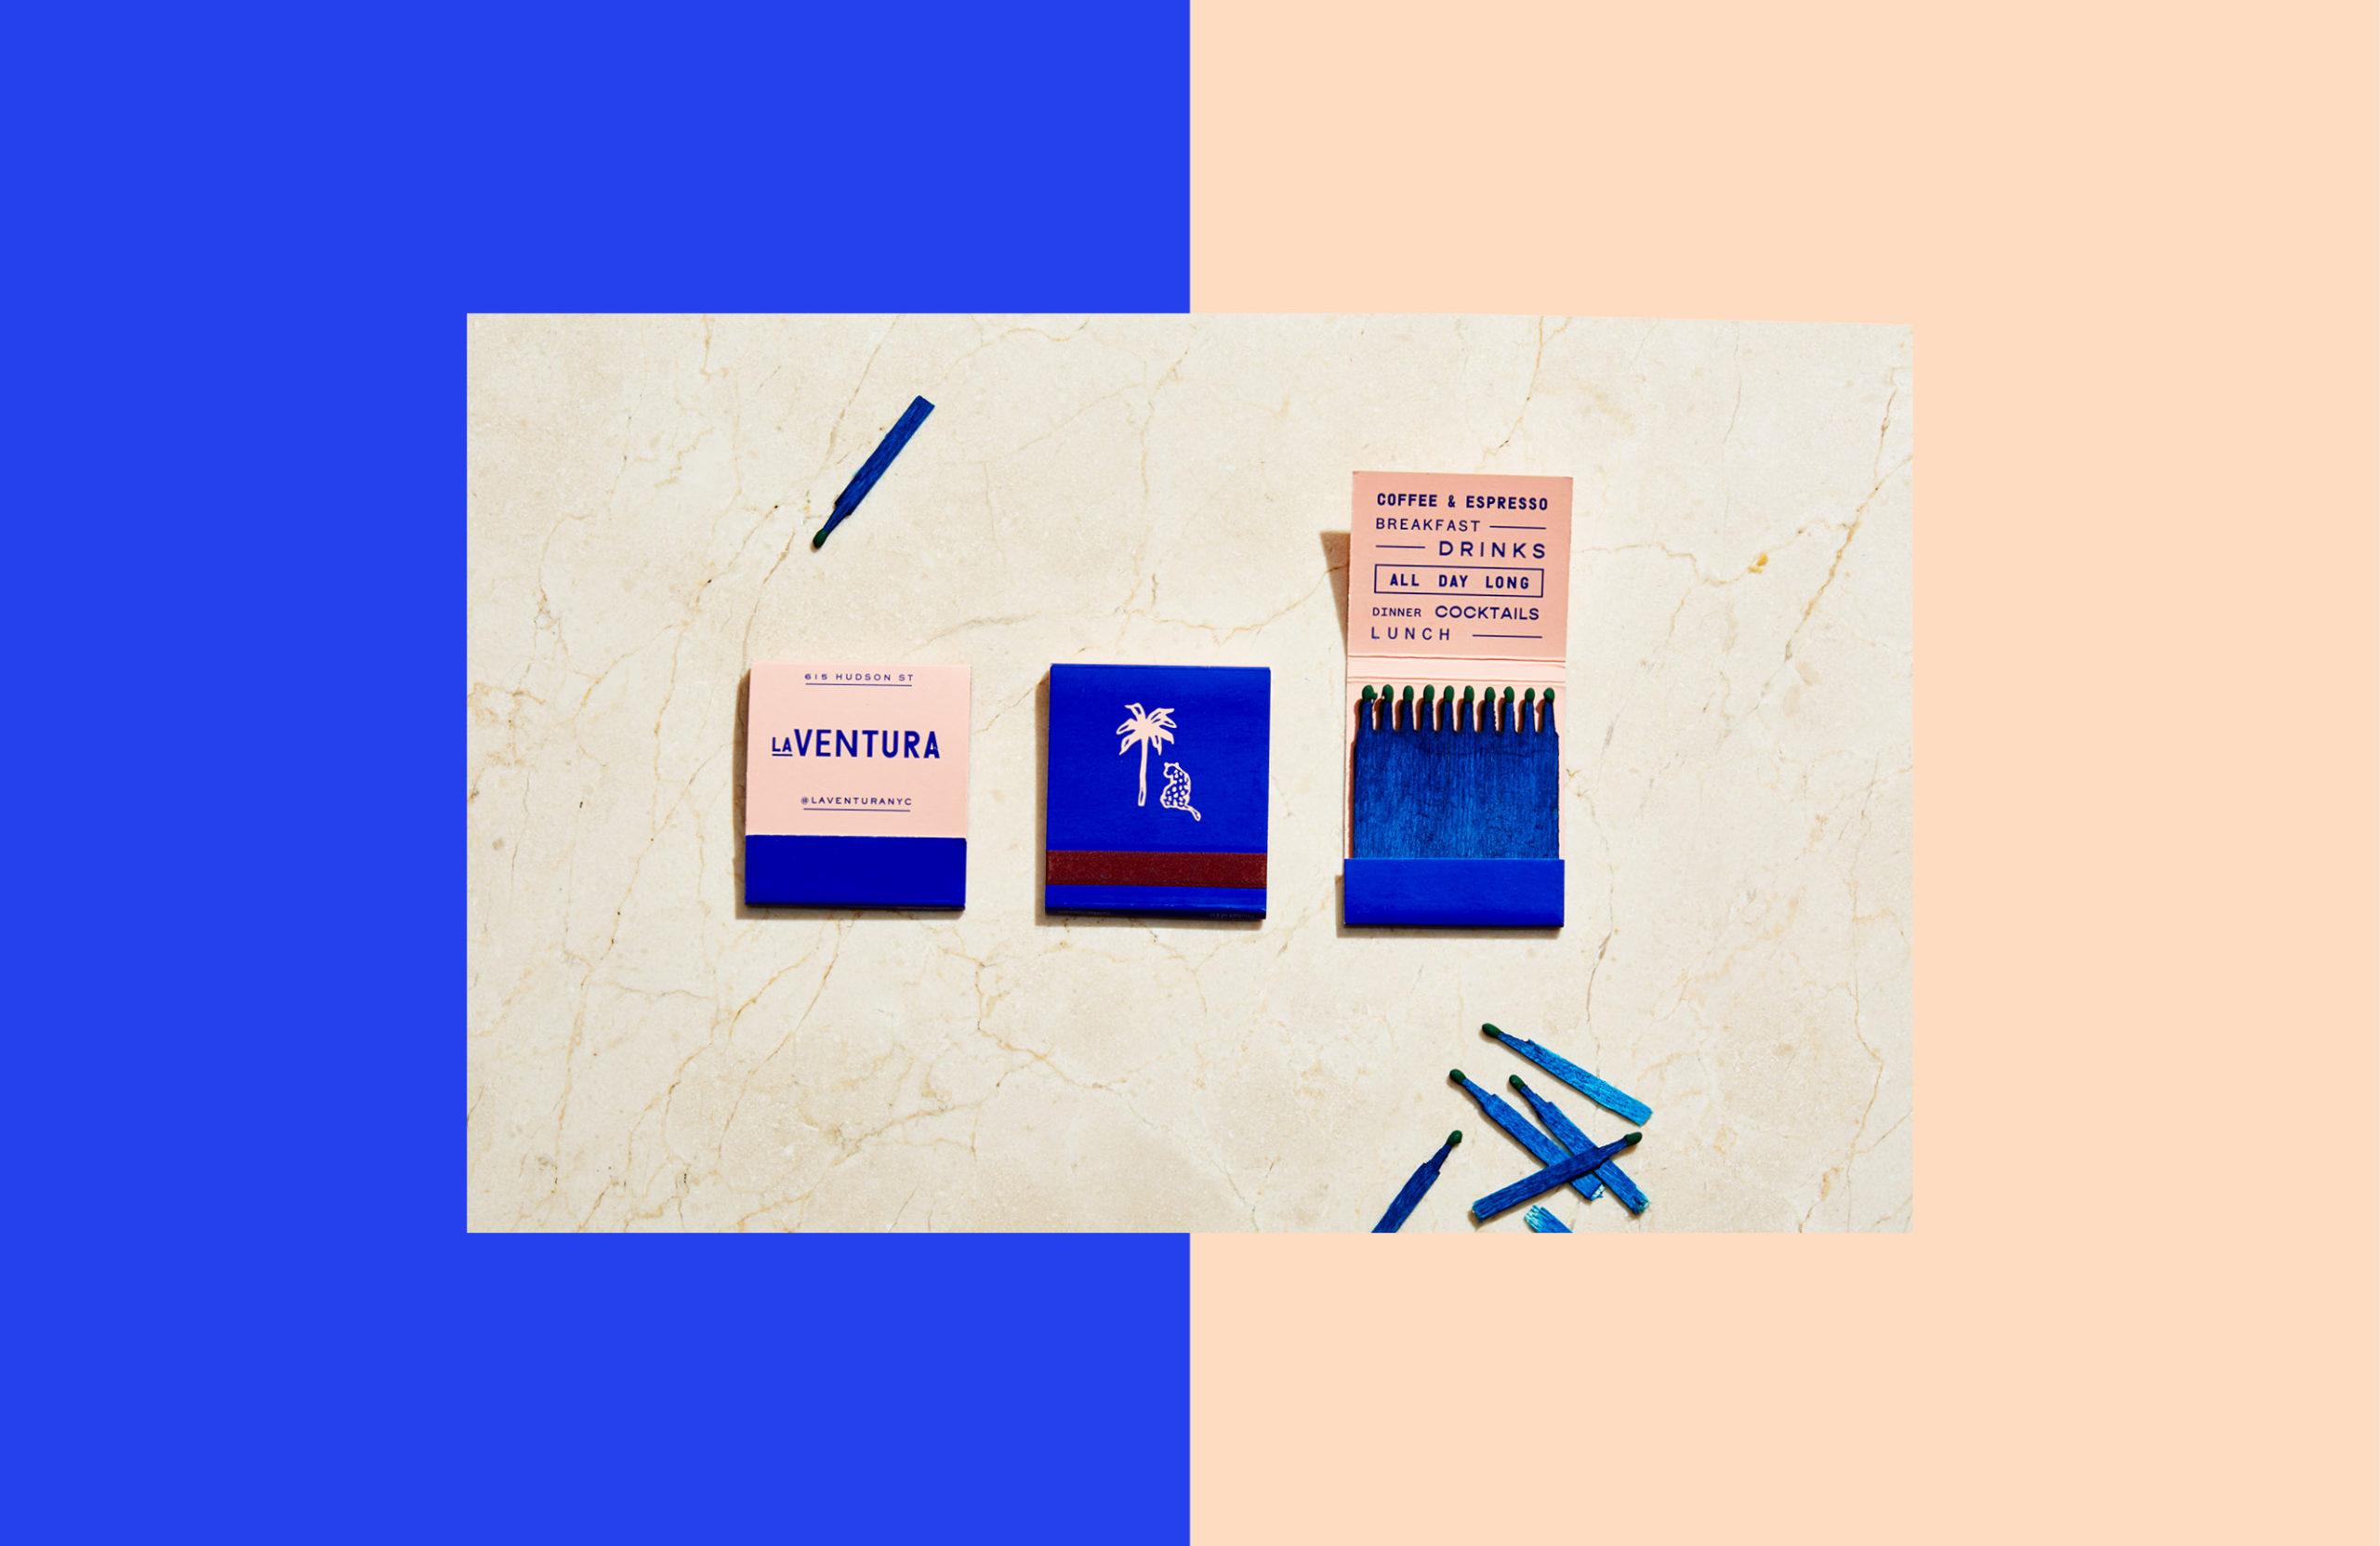 La Ventura matchbooks